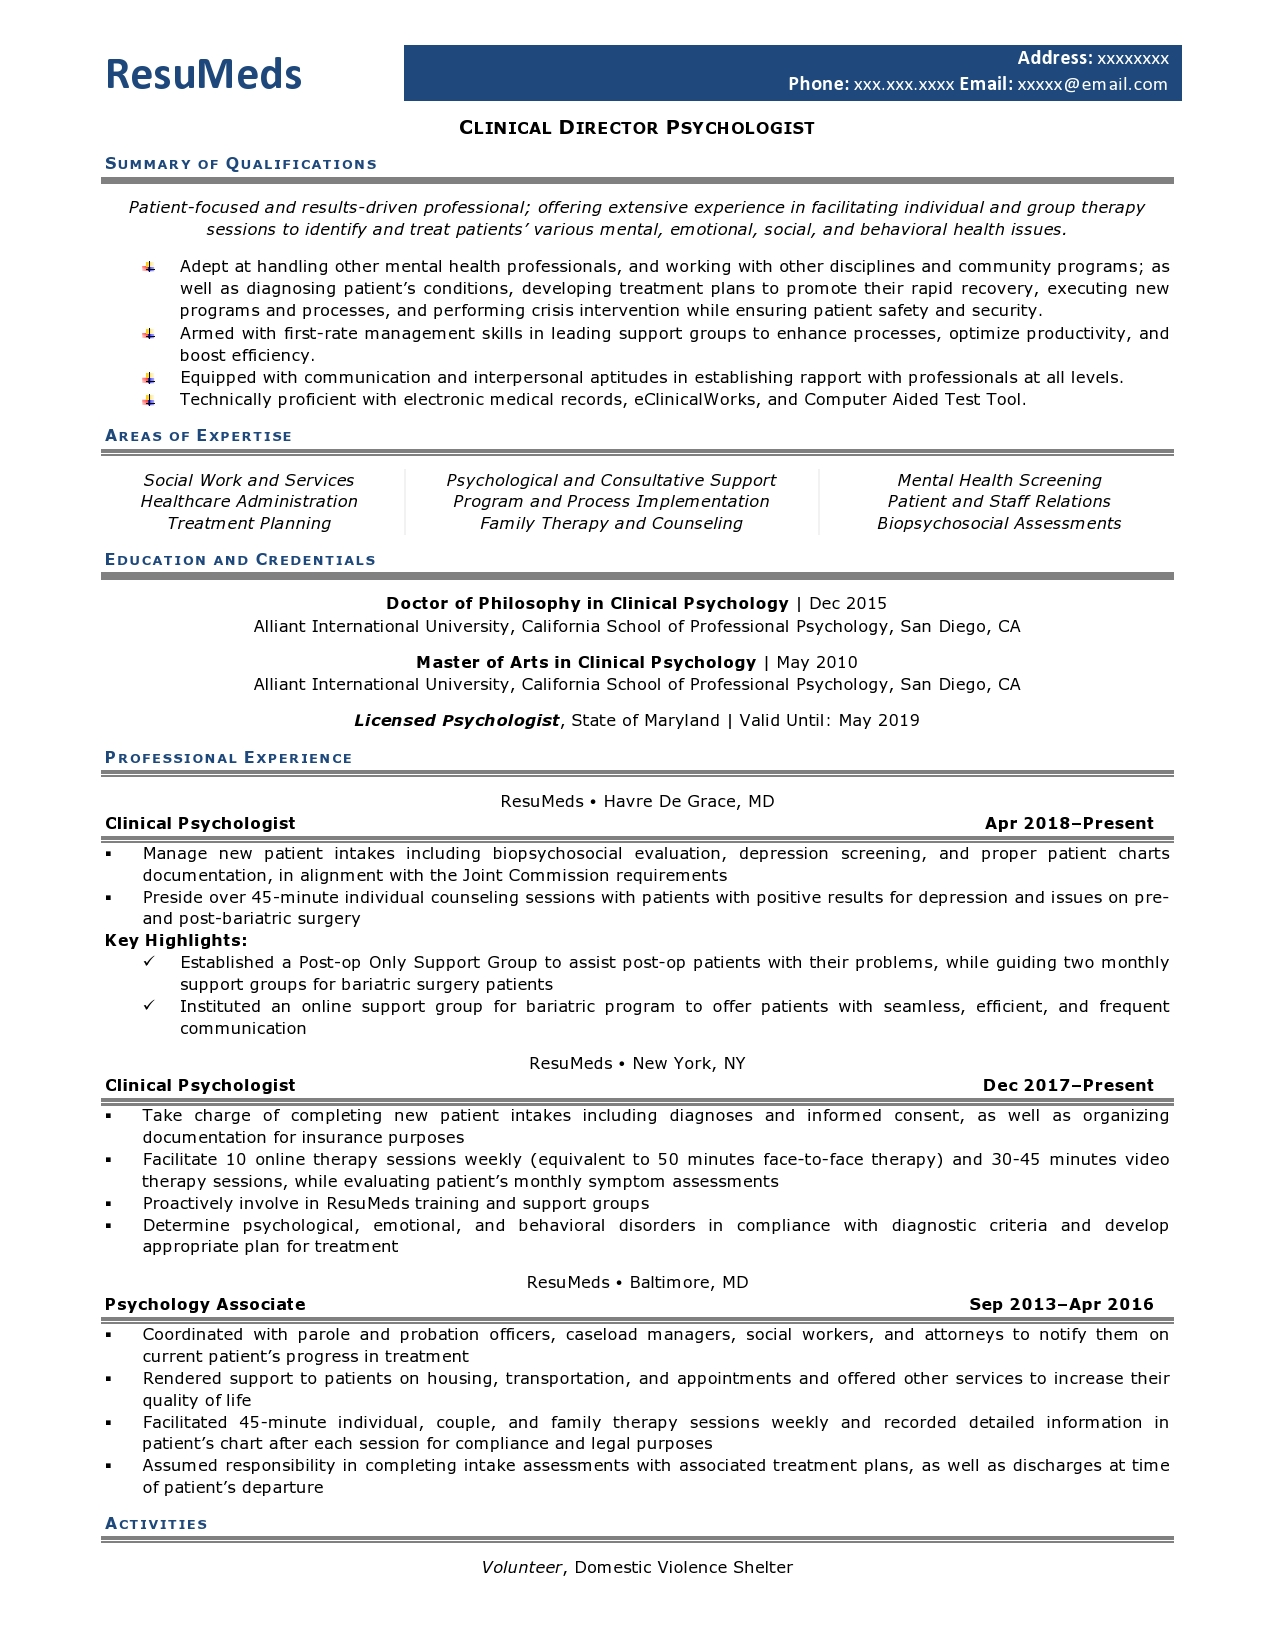 ResuMeds_ClinicalDirectorPsychologist-page0001